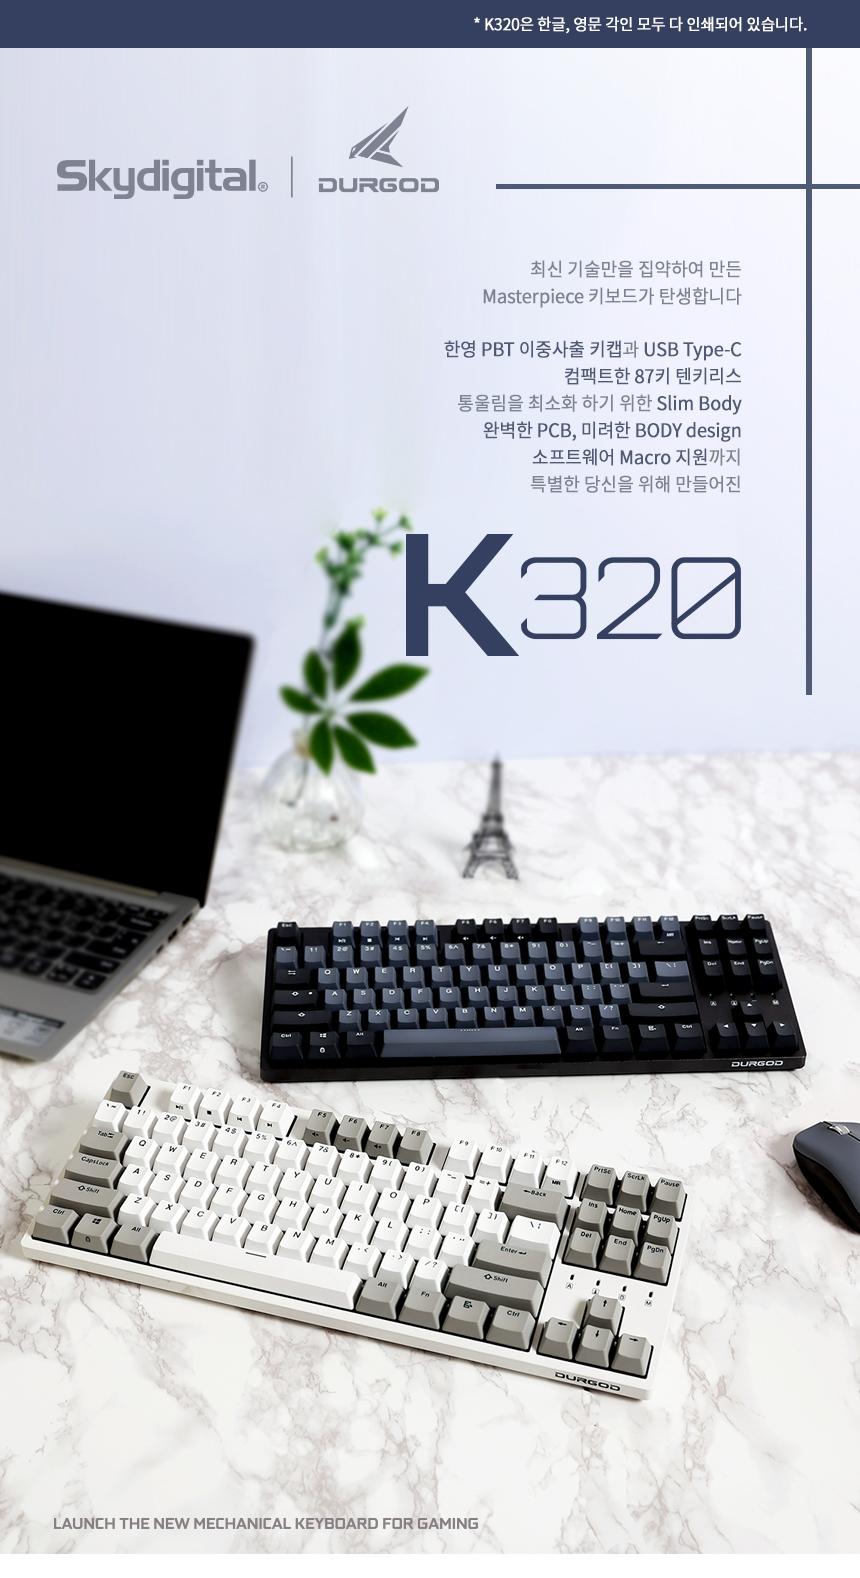 DURGOD TAURUS K320 한영 PBT 기계식 키보드(스페이스 그레이, 갈축)